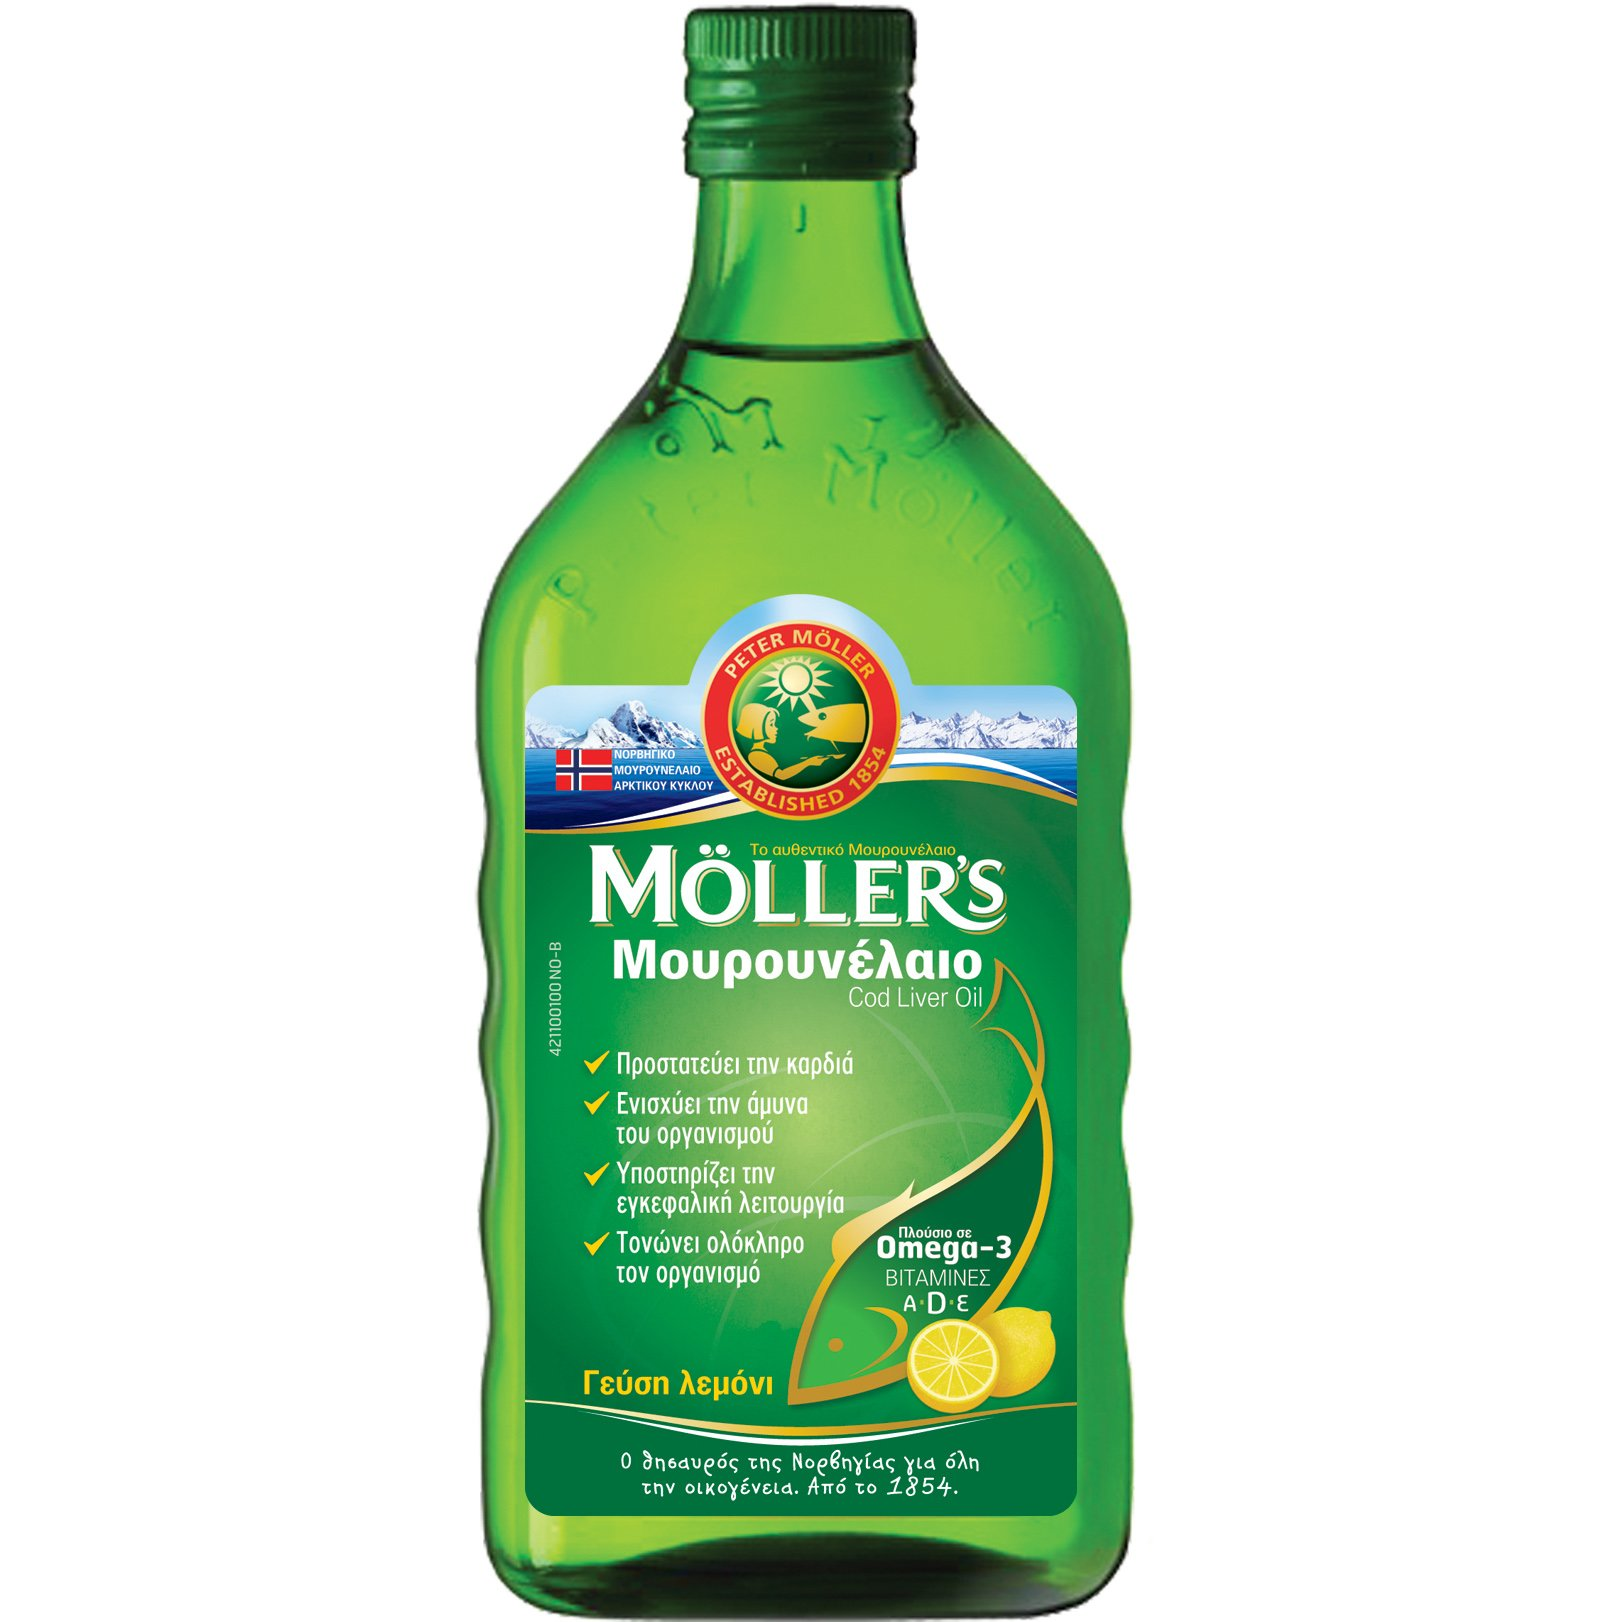 Möller's Μουρουνέλαιο Cod Liver Oil Lemon Πλούσιο σε Ωμέγα-3 με Βιταμίνες A,D & E με Γεύση Λεμόνι 250ml